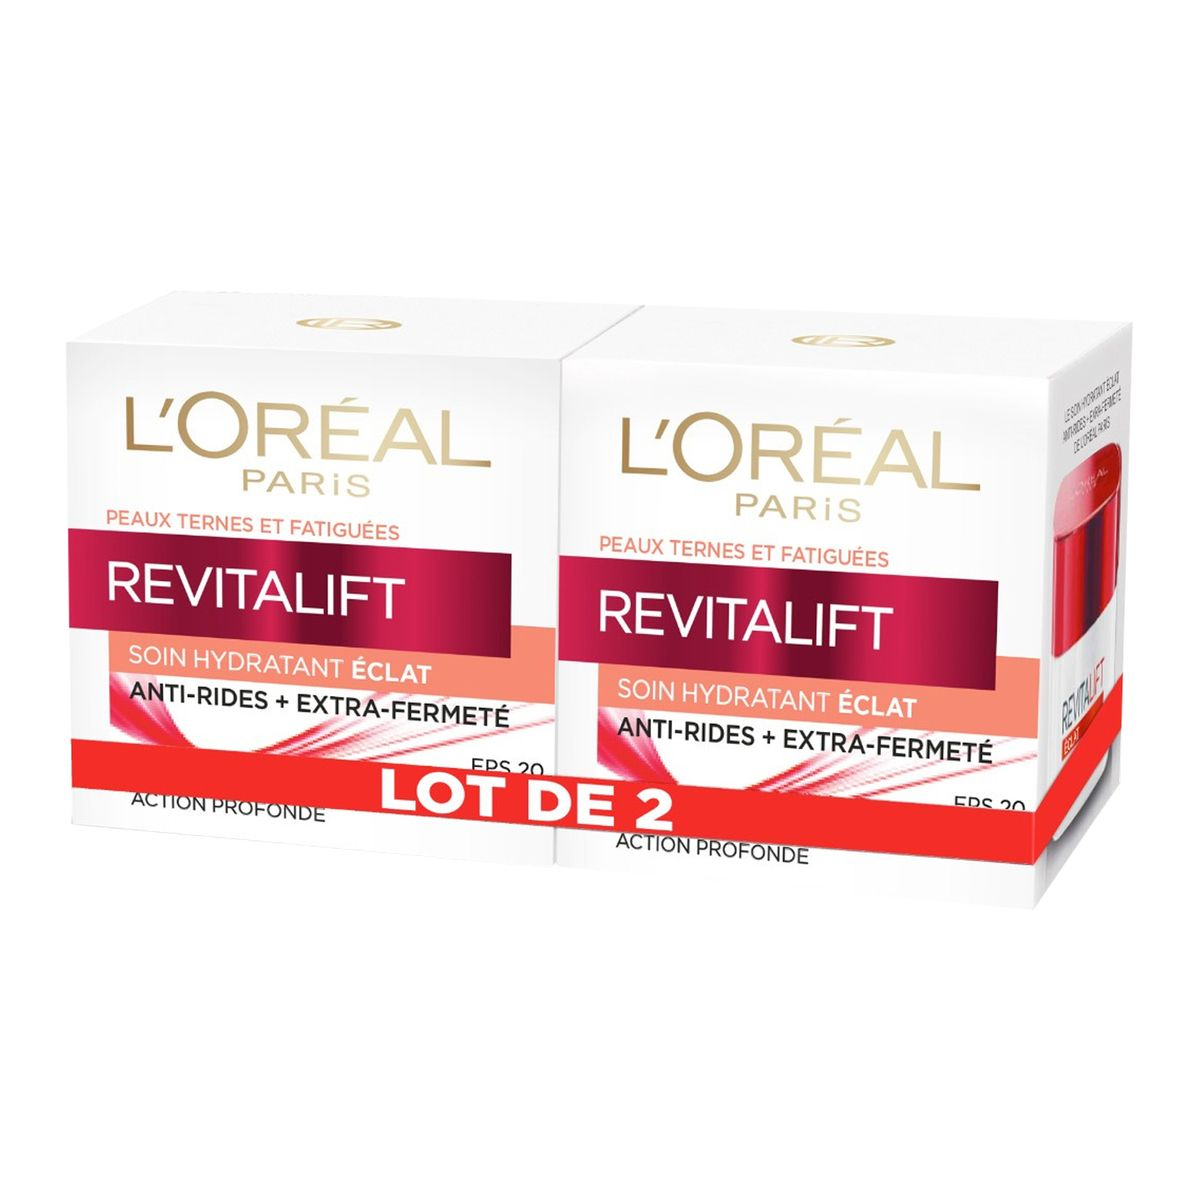 L'Oréal Revitalift soin hydratant éclat 2x50ml